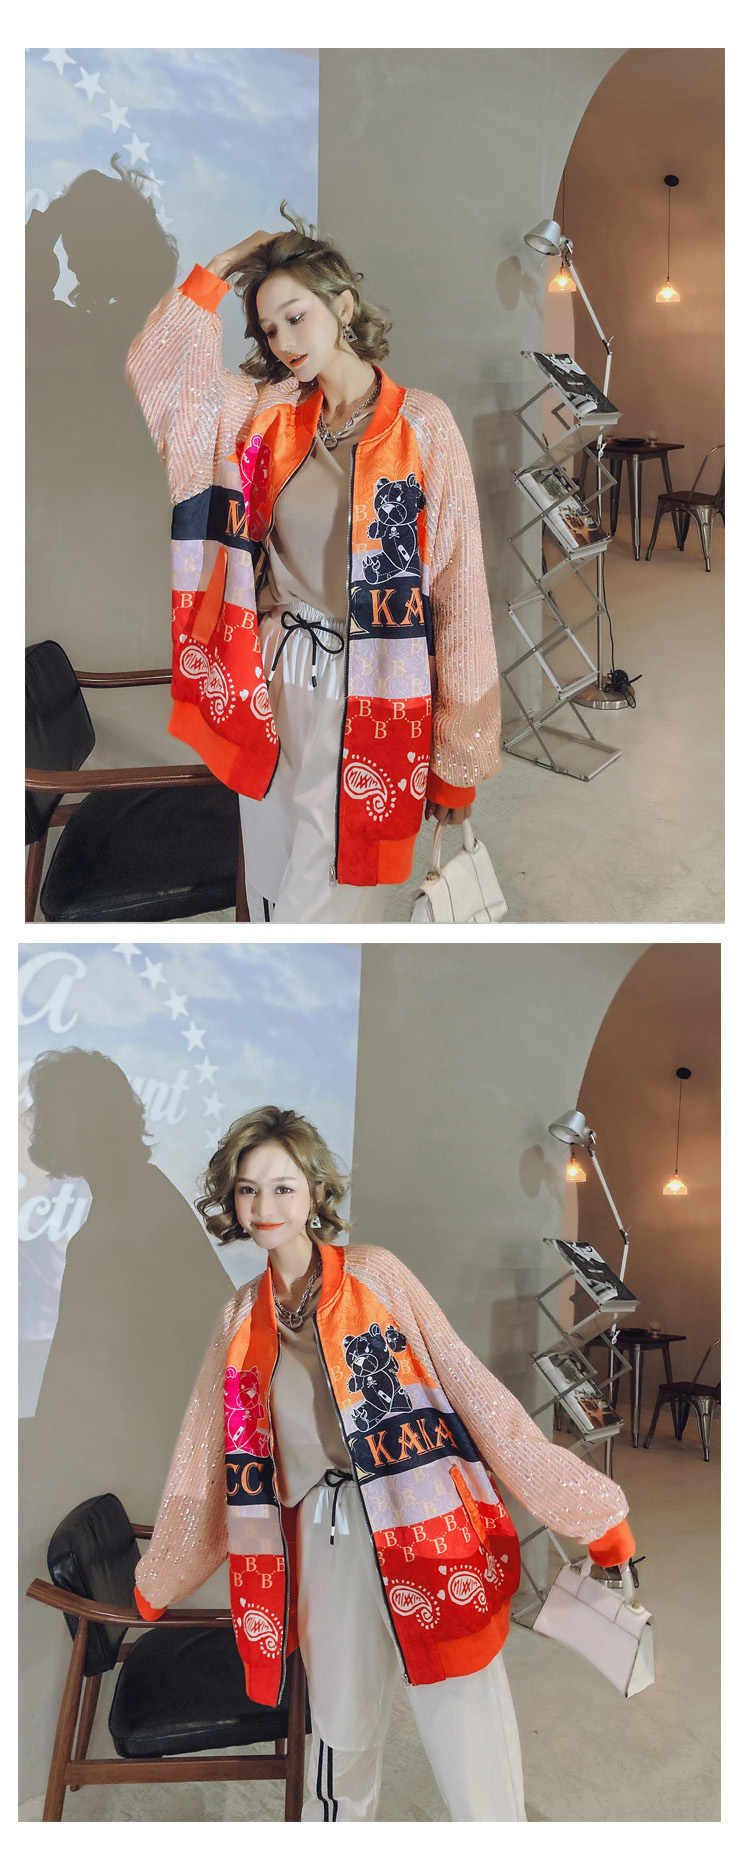 Ha504f267d6fa43c1a9b021a29cbe20cel 2021 Spring Women Long Sequins Print Patchwork Loose Coat